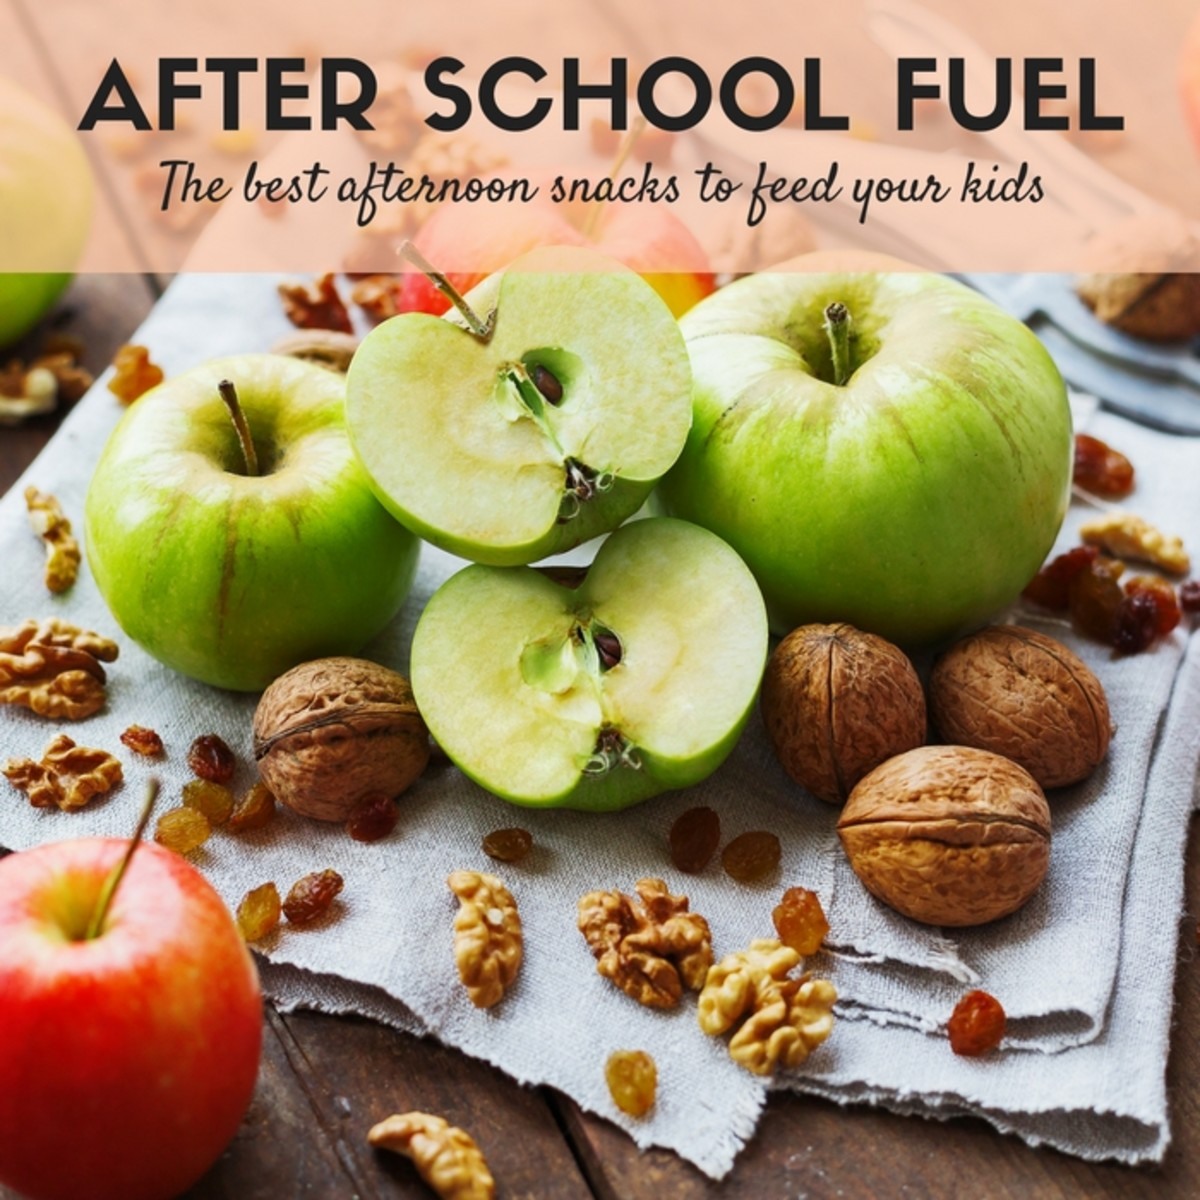 After School Fuel - Best Snacks for Kids